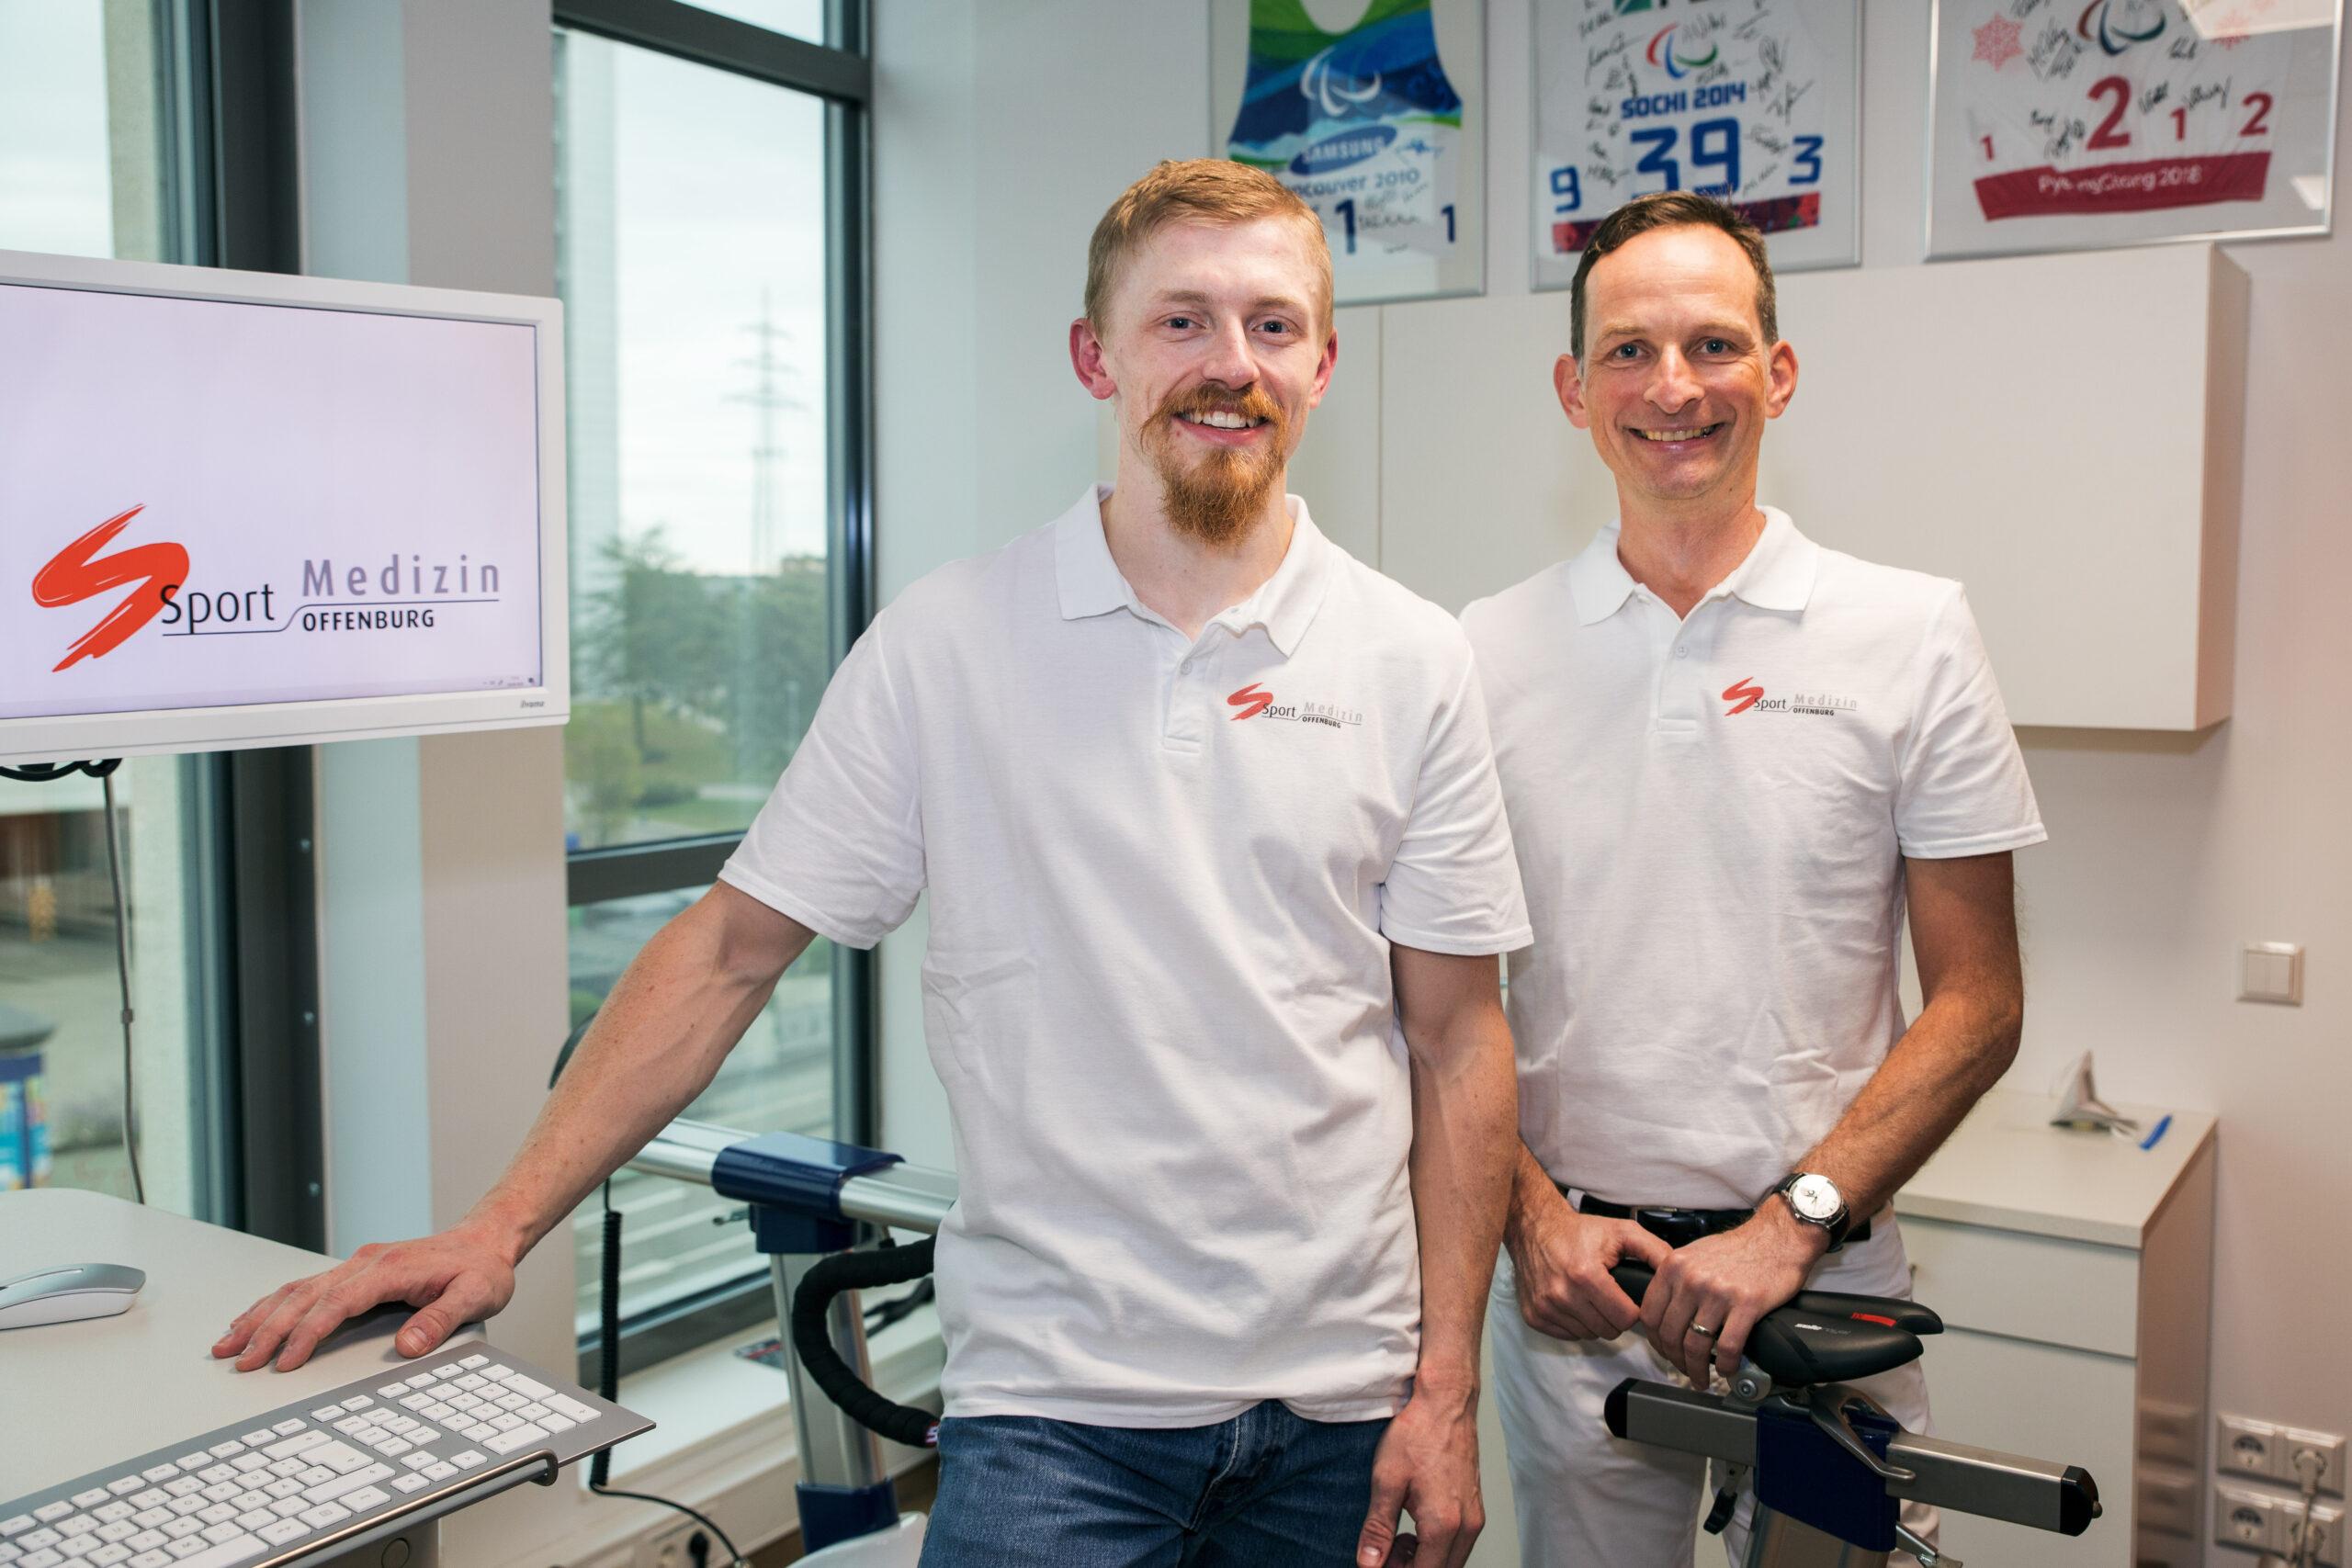 Dr. Lars Meiworm und Carl-Maximilian Wagner